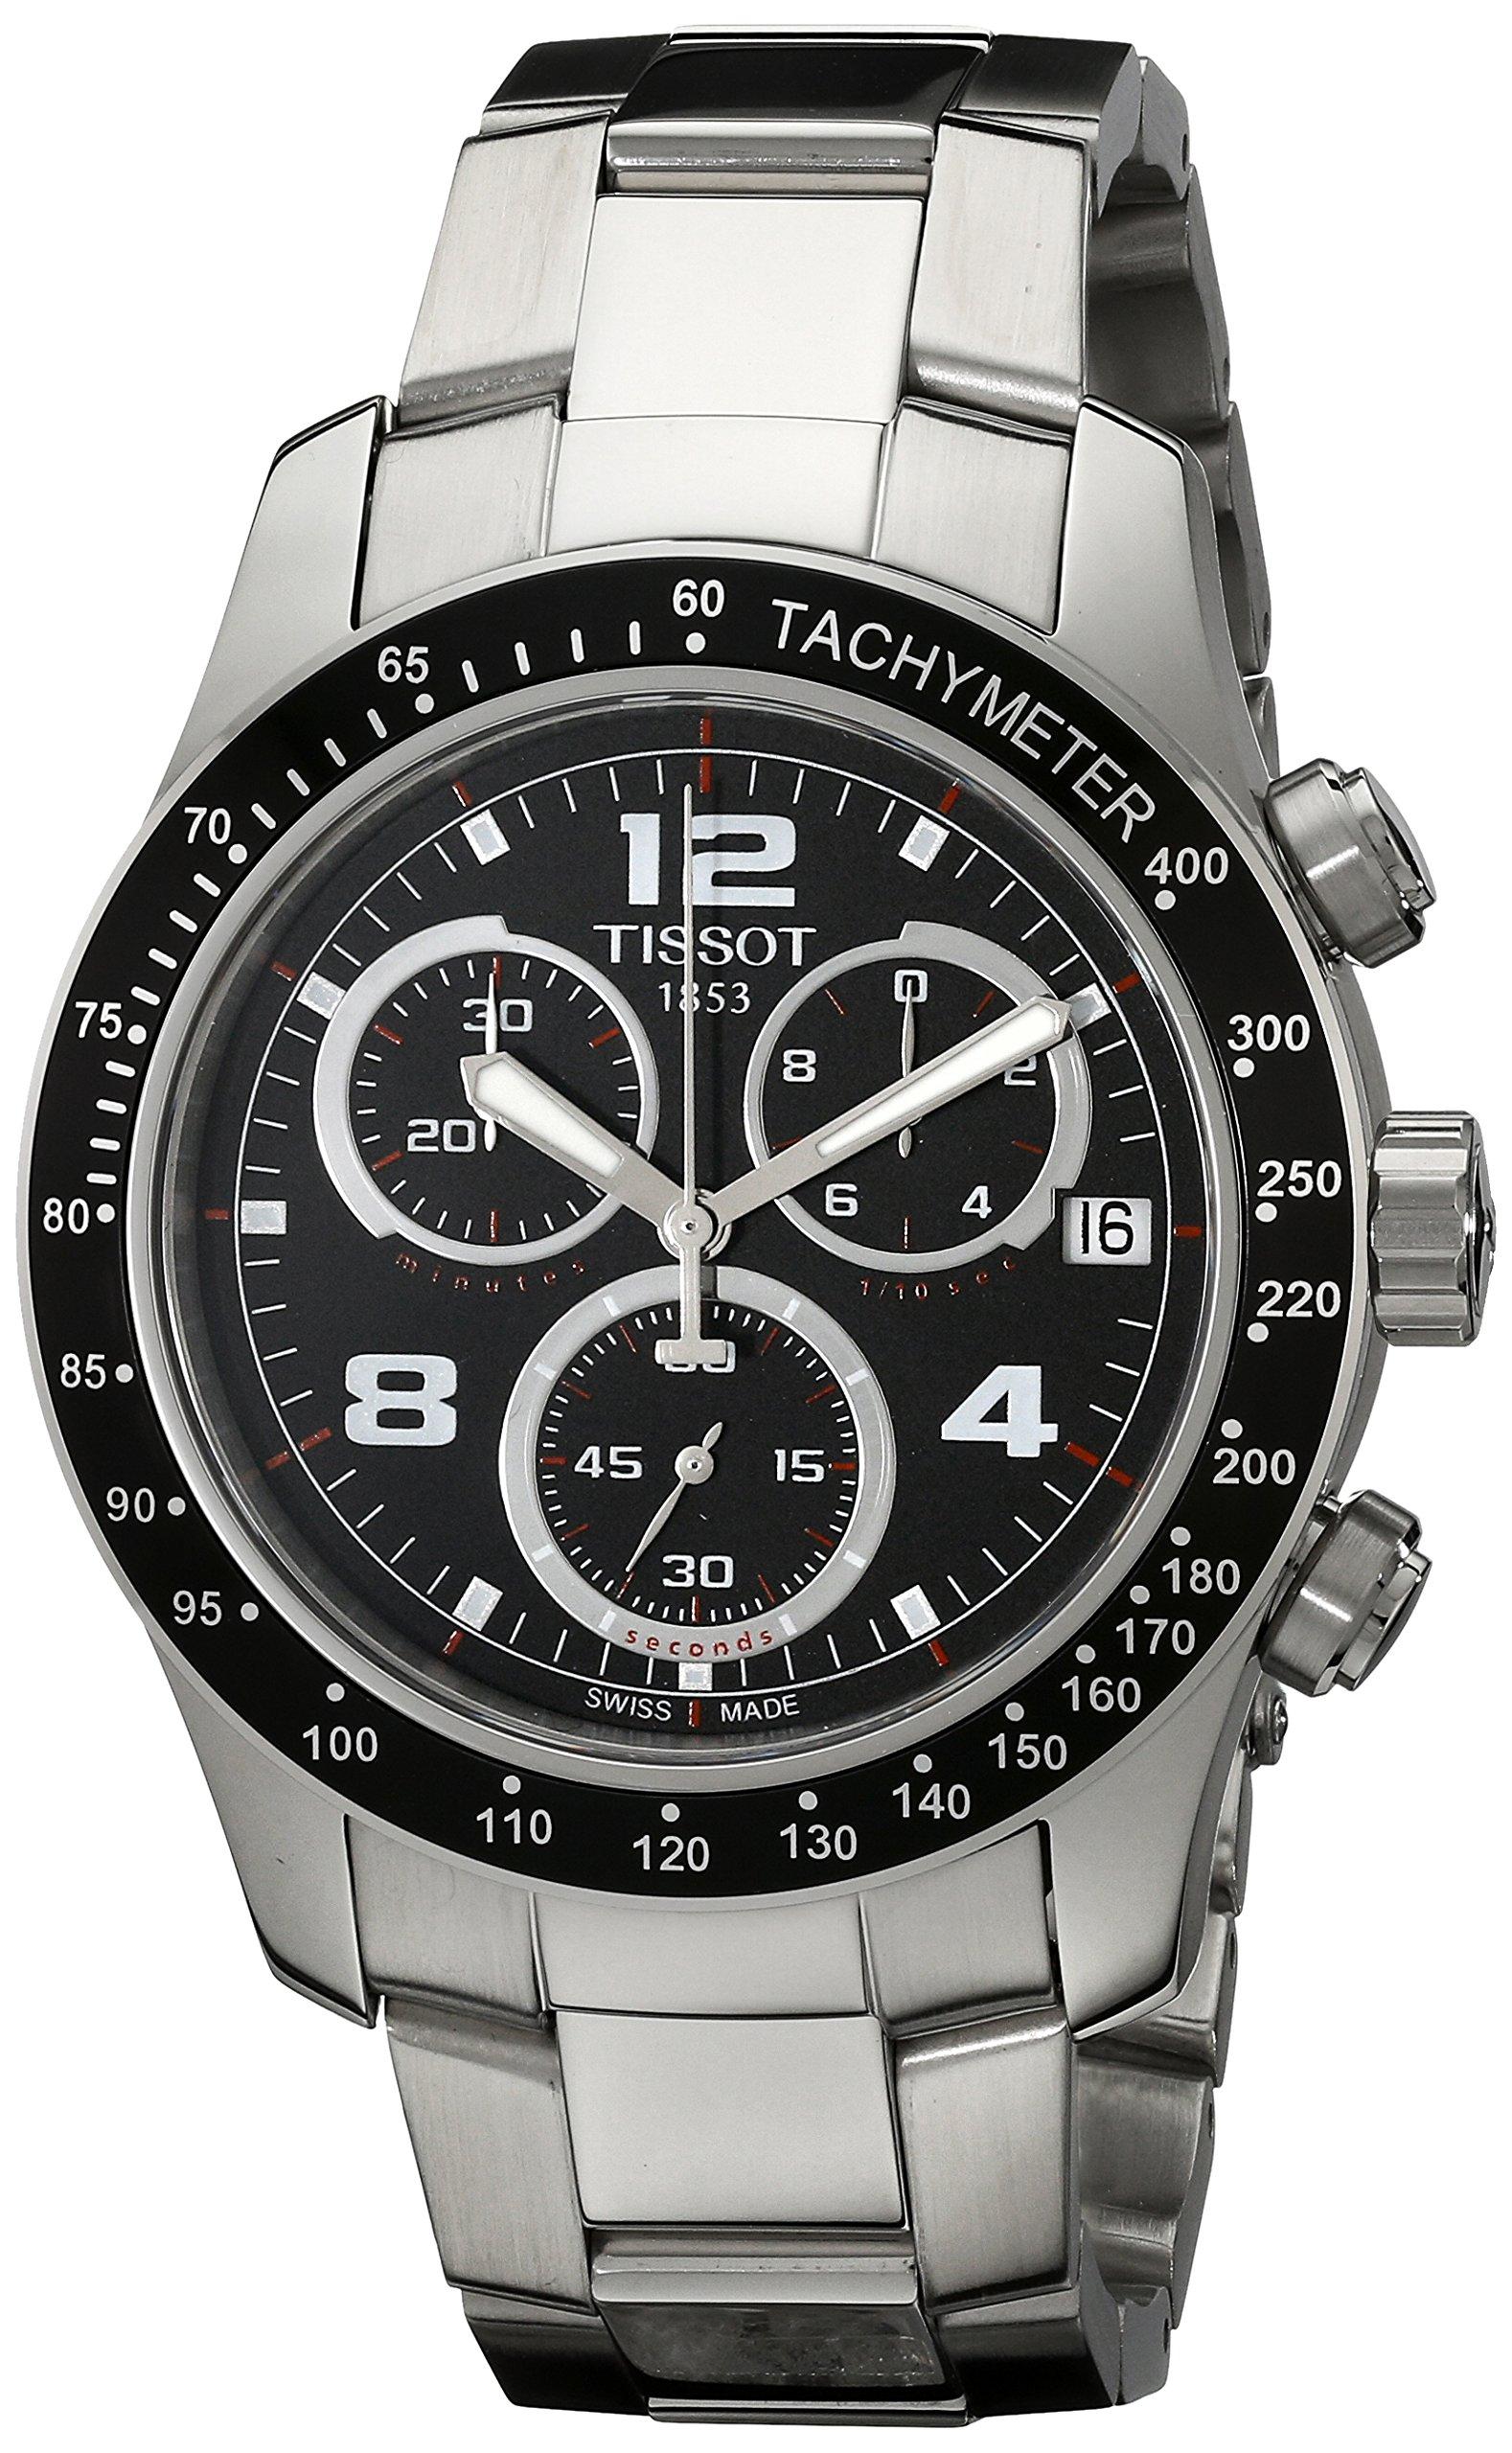 Tissot V8 – Reloj (Reloj de Pulsera, Masculino, Acero Inoxidable, Negro, Acero Inoxidable, Acero Inoxidable, Plata, Acero Inoxidable)